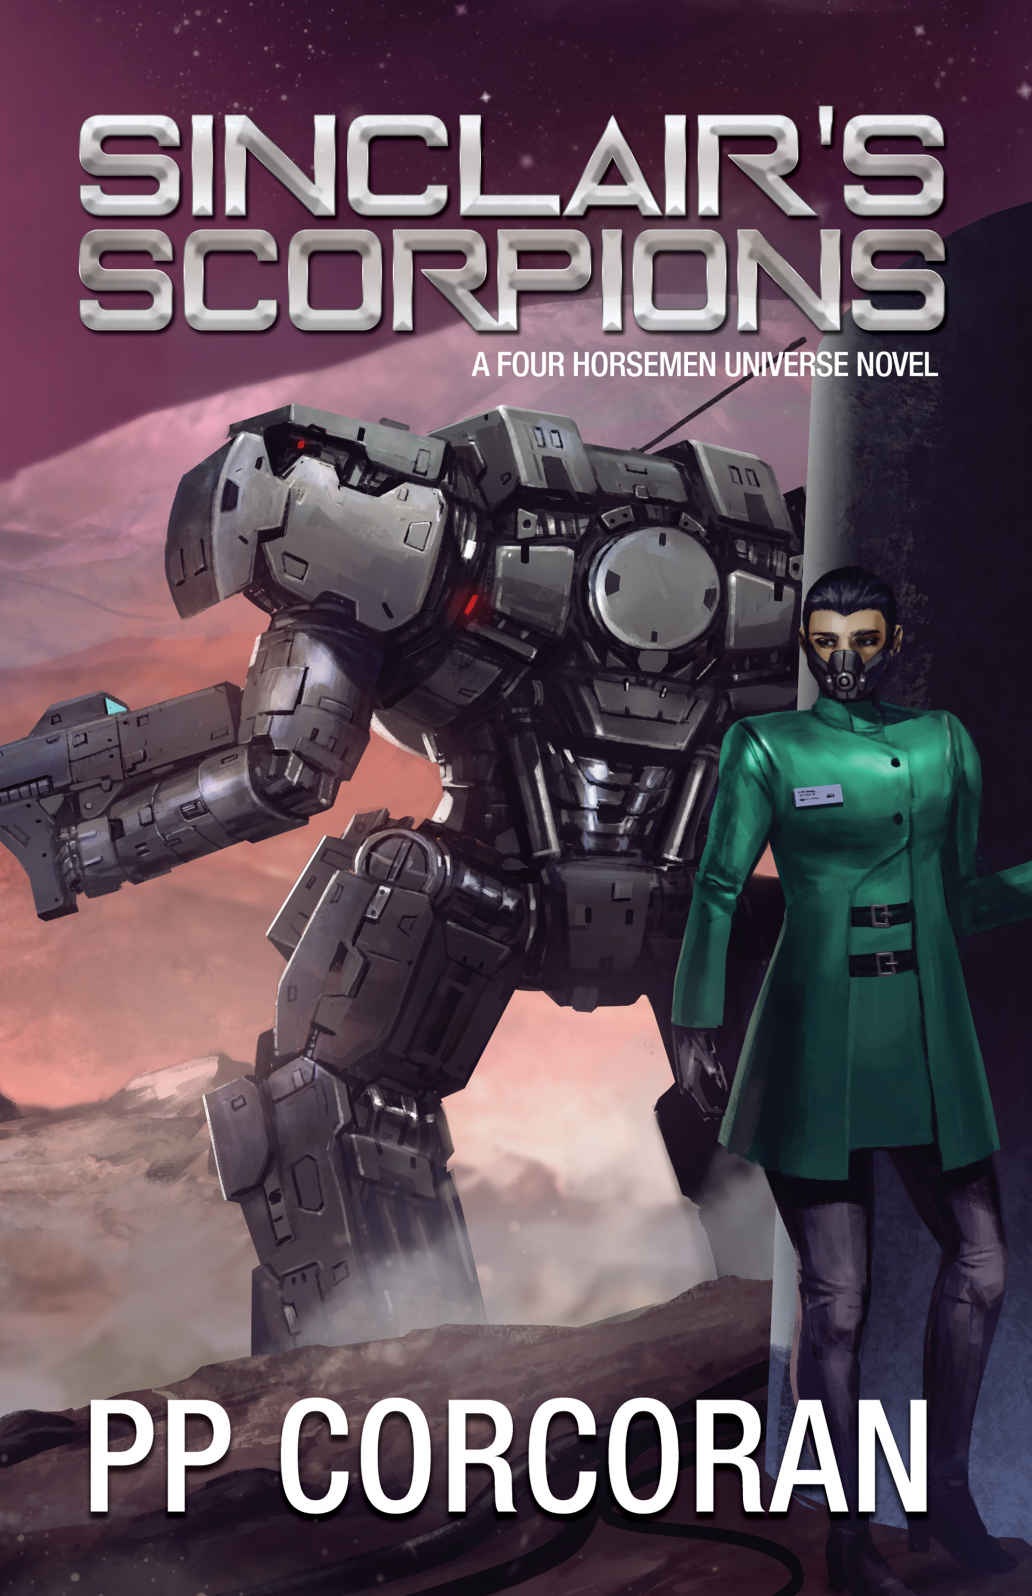 Sinclair's Scorpions